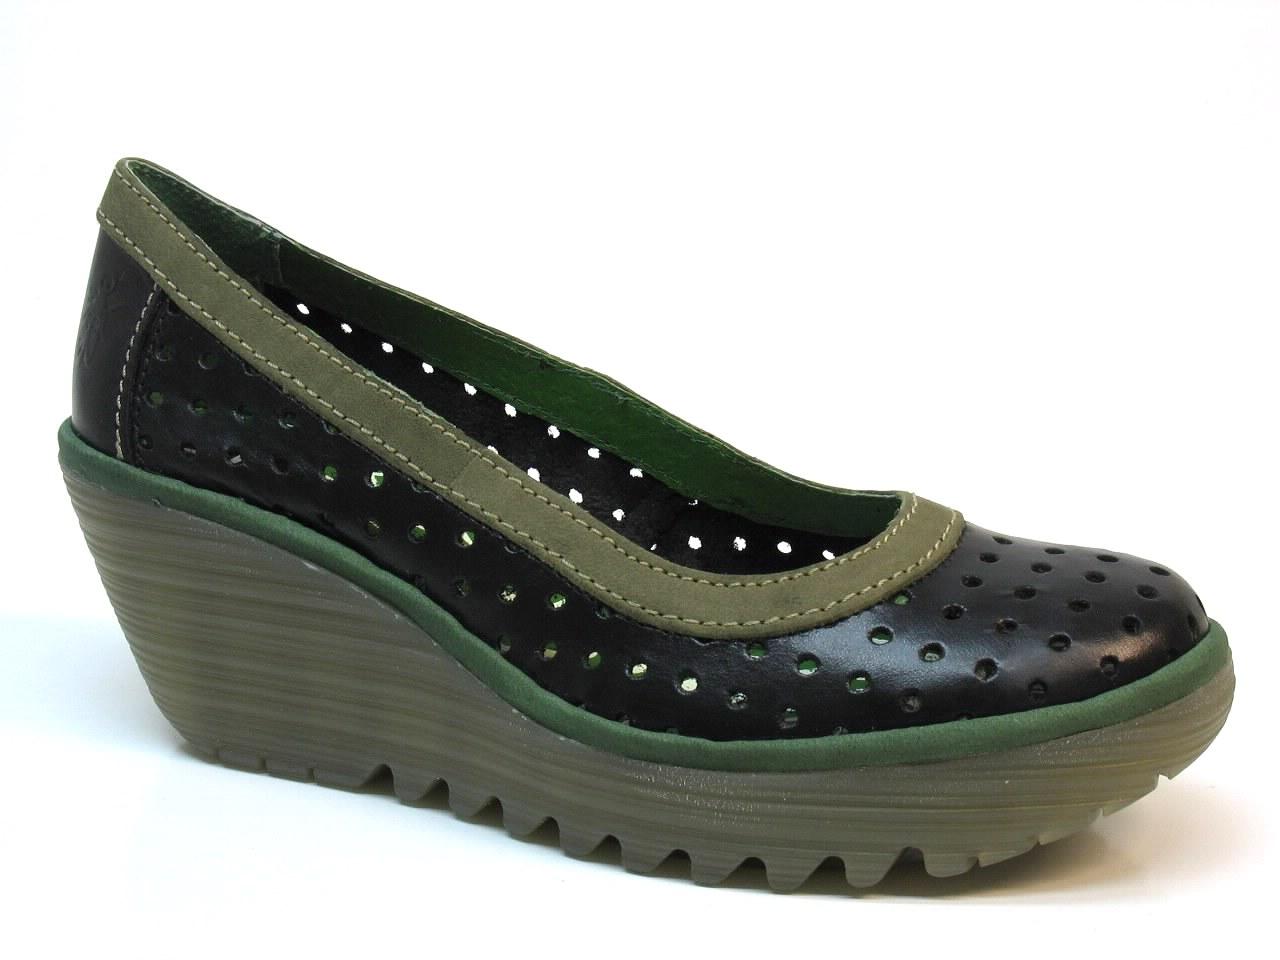 Chaussures à Talons Compensés Fly London - 339 YEDI PERF